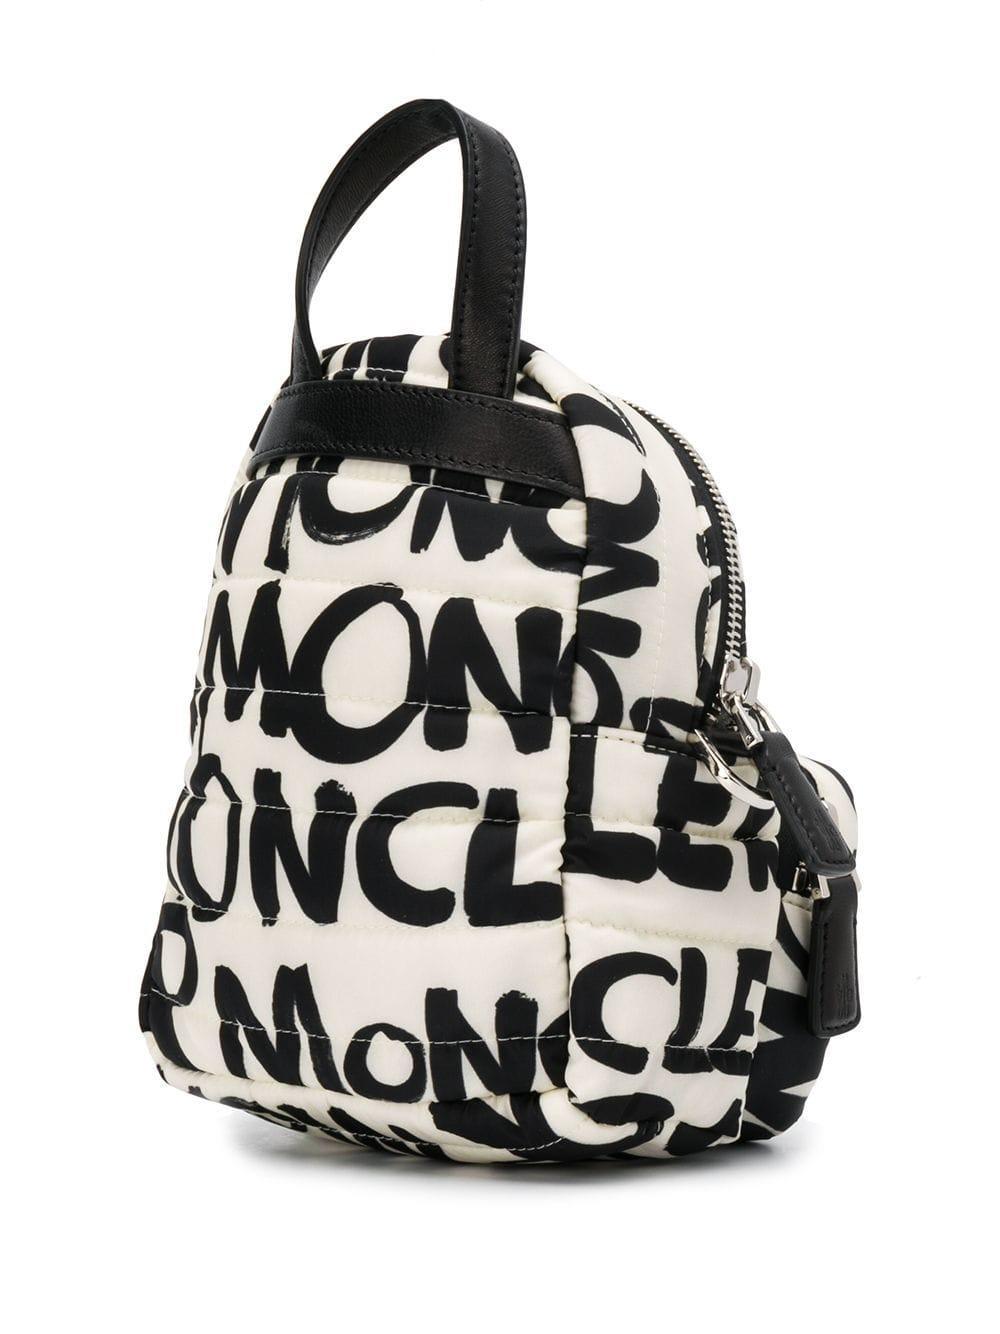 066c96a0c Moncler Georgine Logo Print Crossbody Bag in Black - Lyst